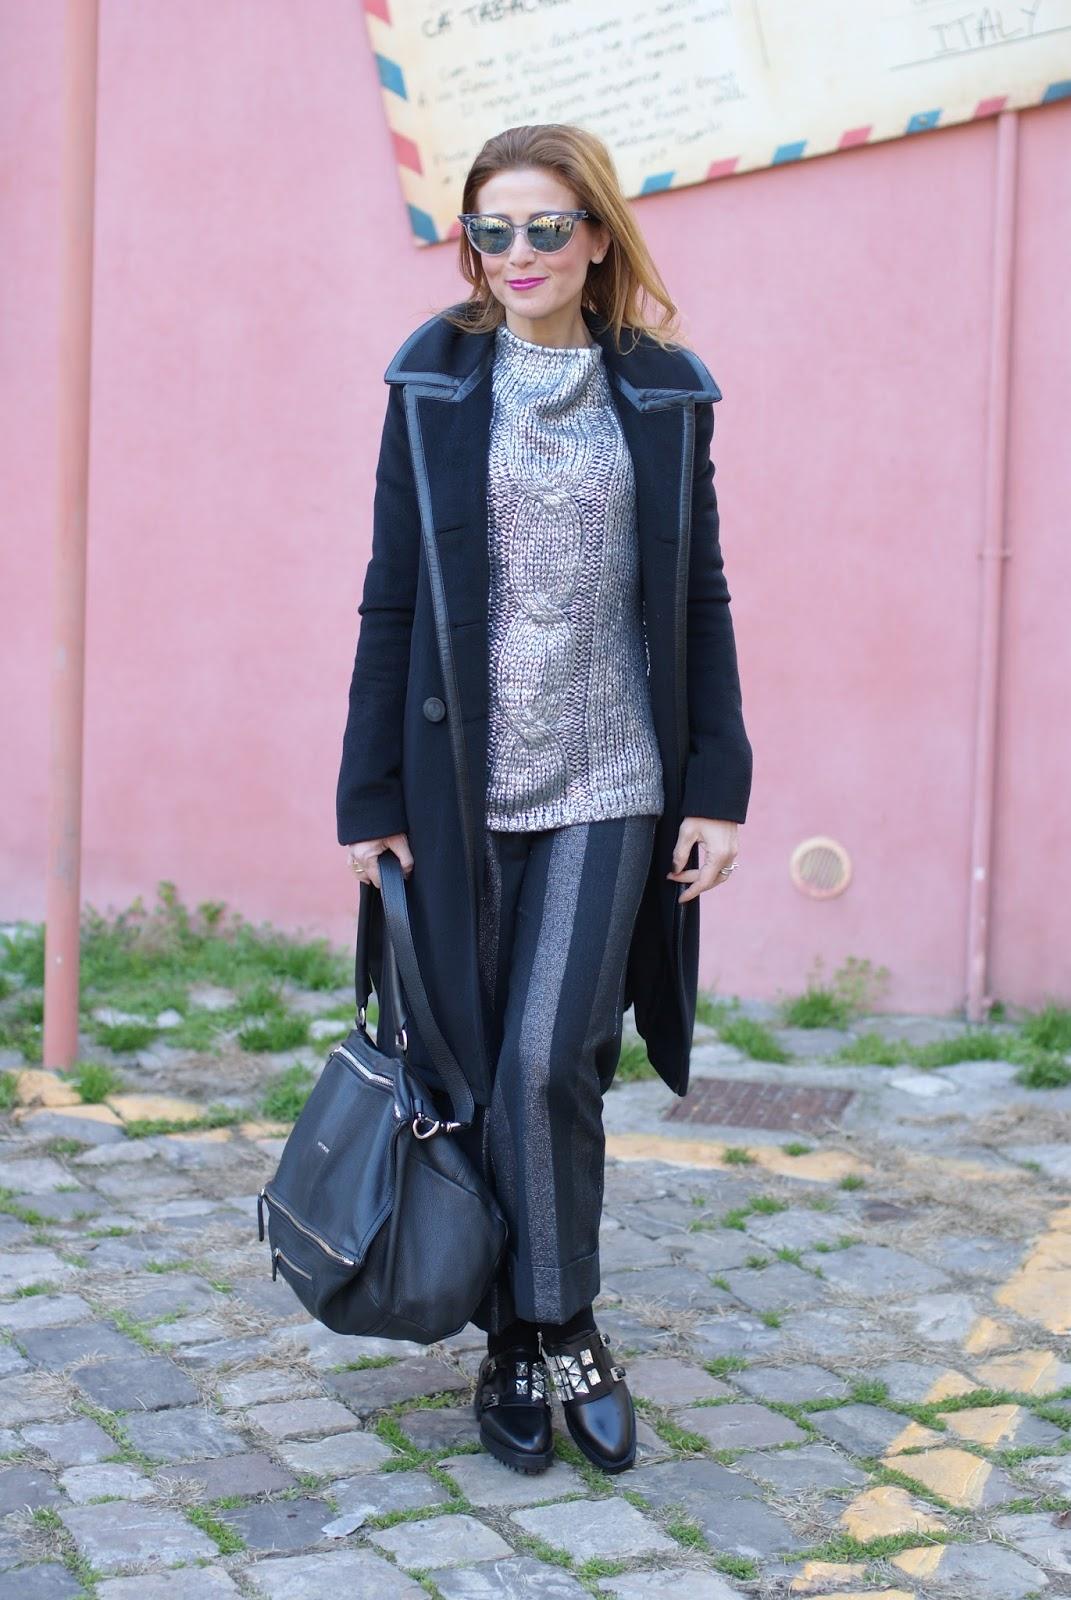 Balenciaga black coat with leather trim on Fashion and Cookies fashion blog, fashion blogger style